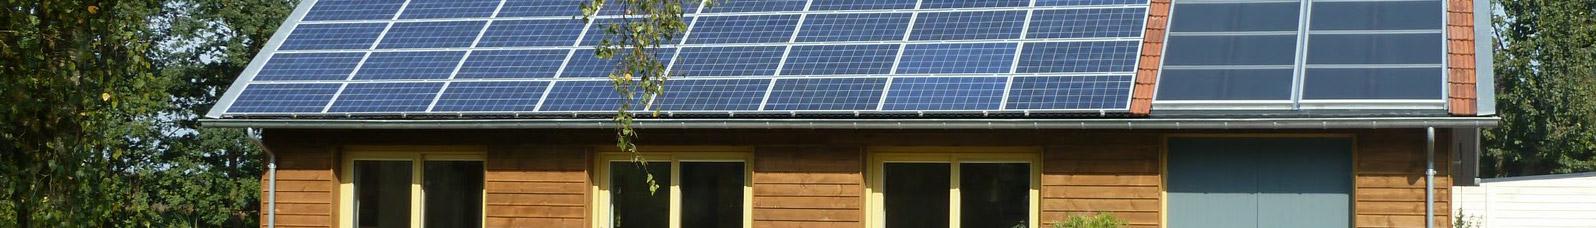 Passief of energieneutraal bouwen bouwbedrijf hab for Energieneutraal bouwen